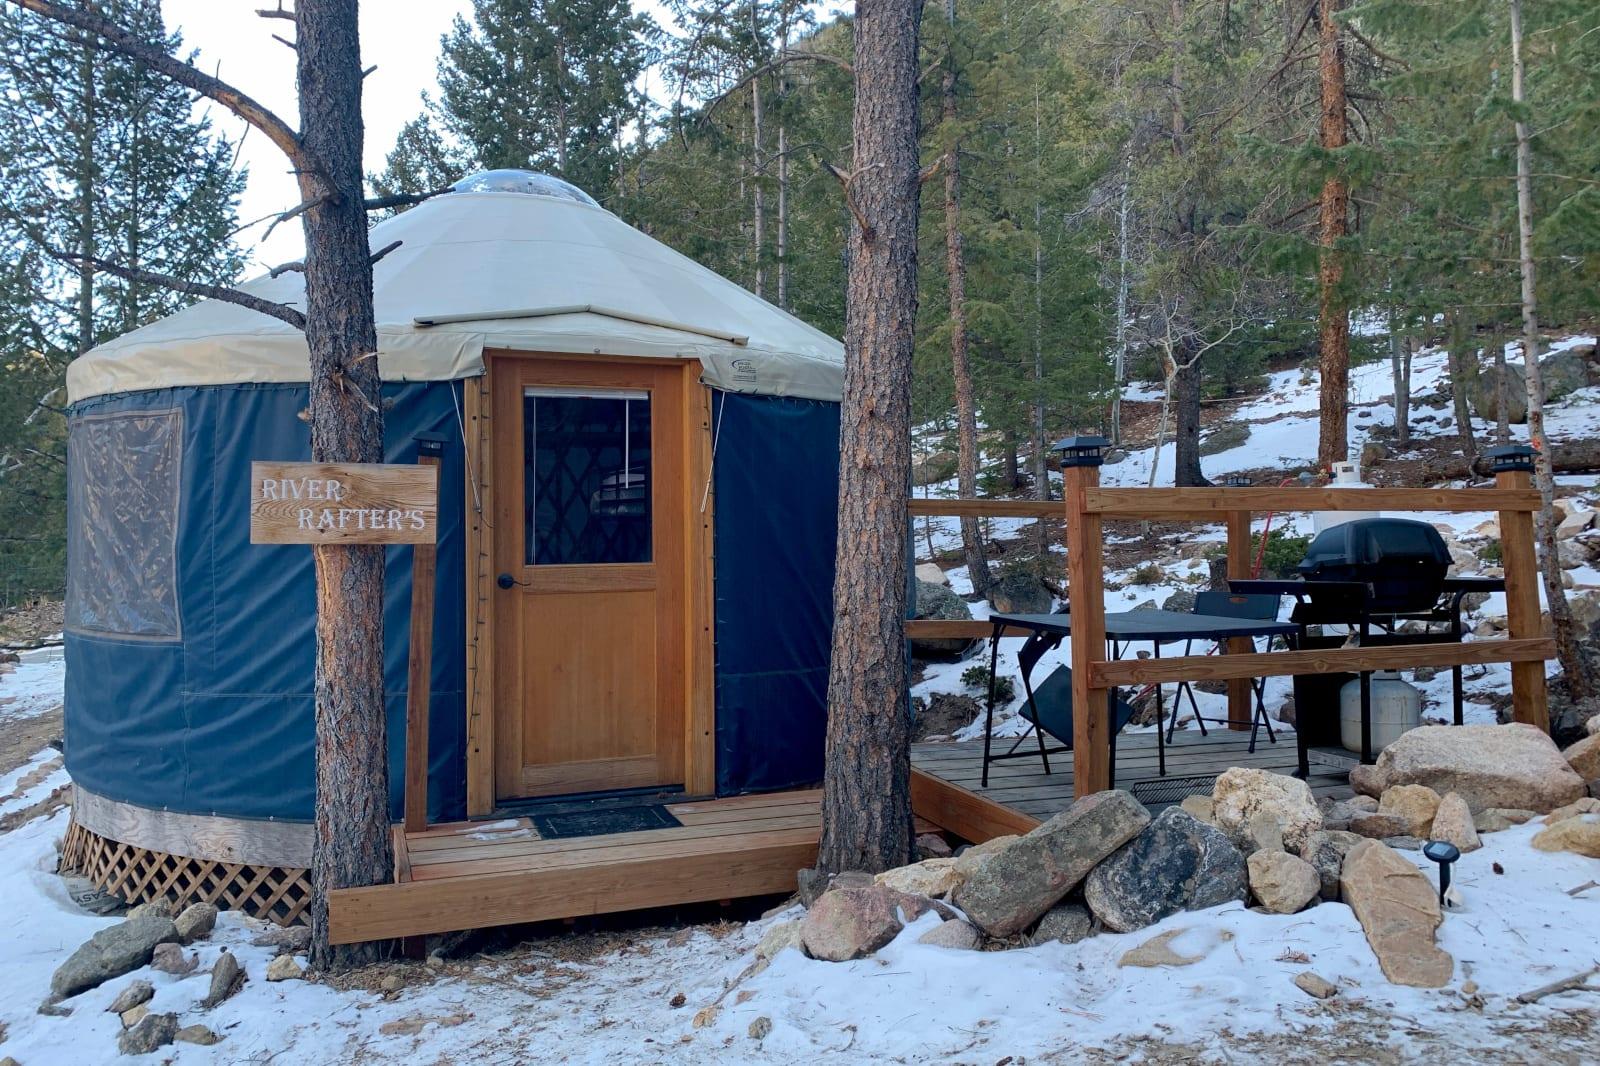 Lawson Adventure Park Resort Yurt Rental